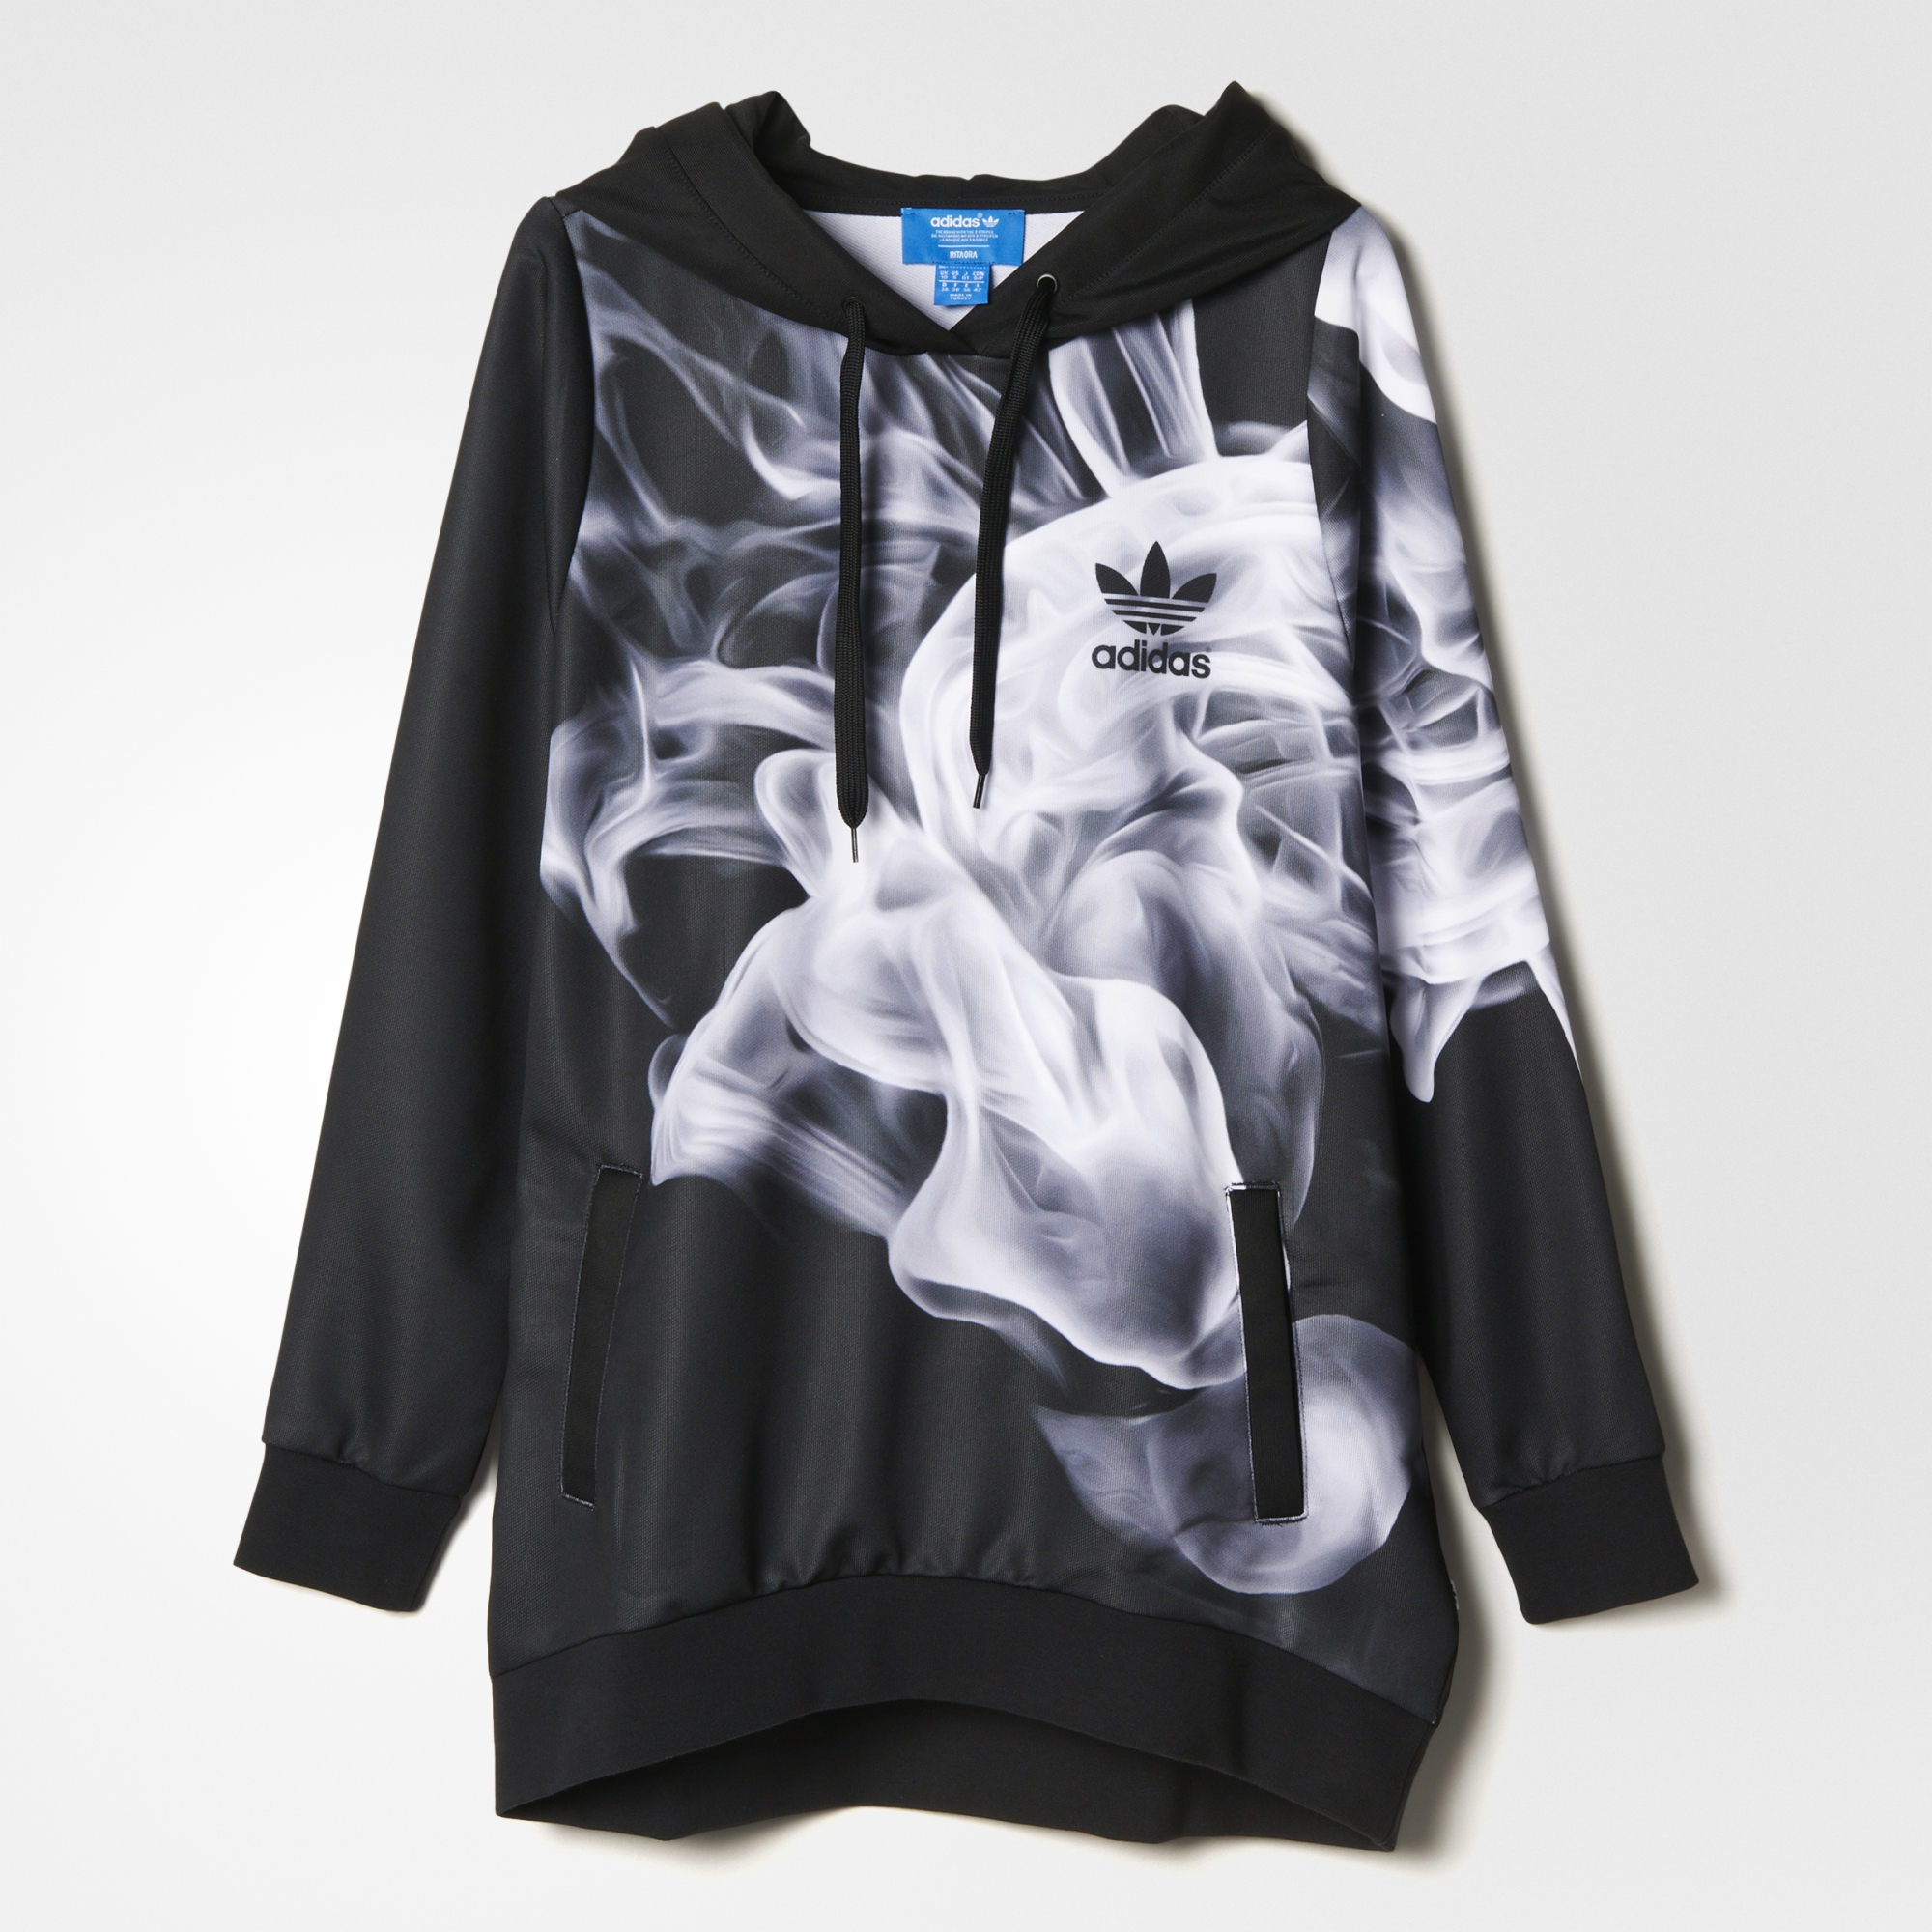 Adidas Flux Black And White Smoke